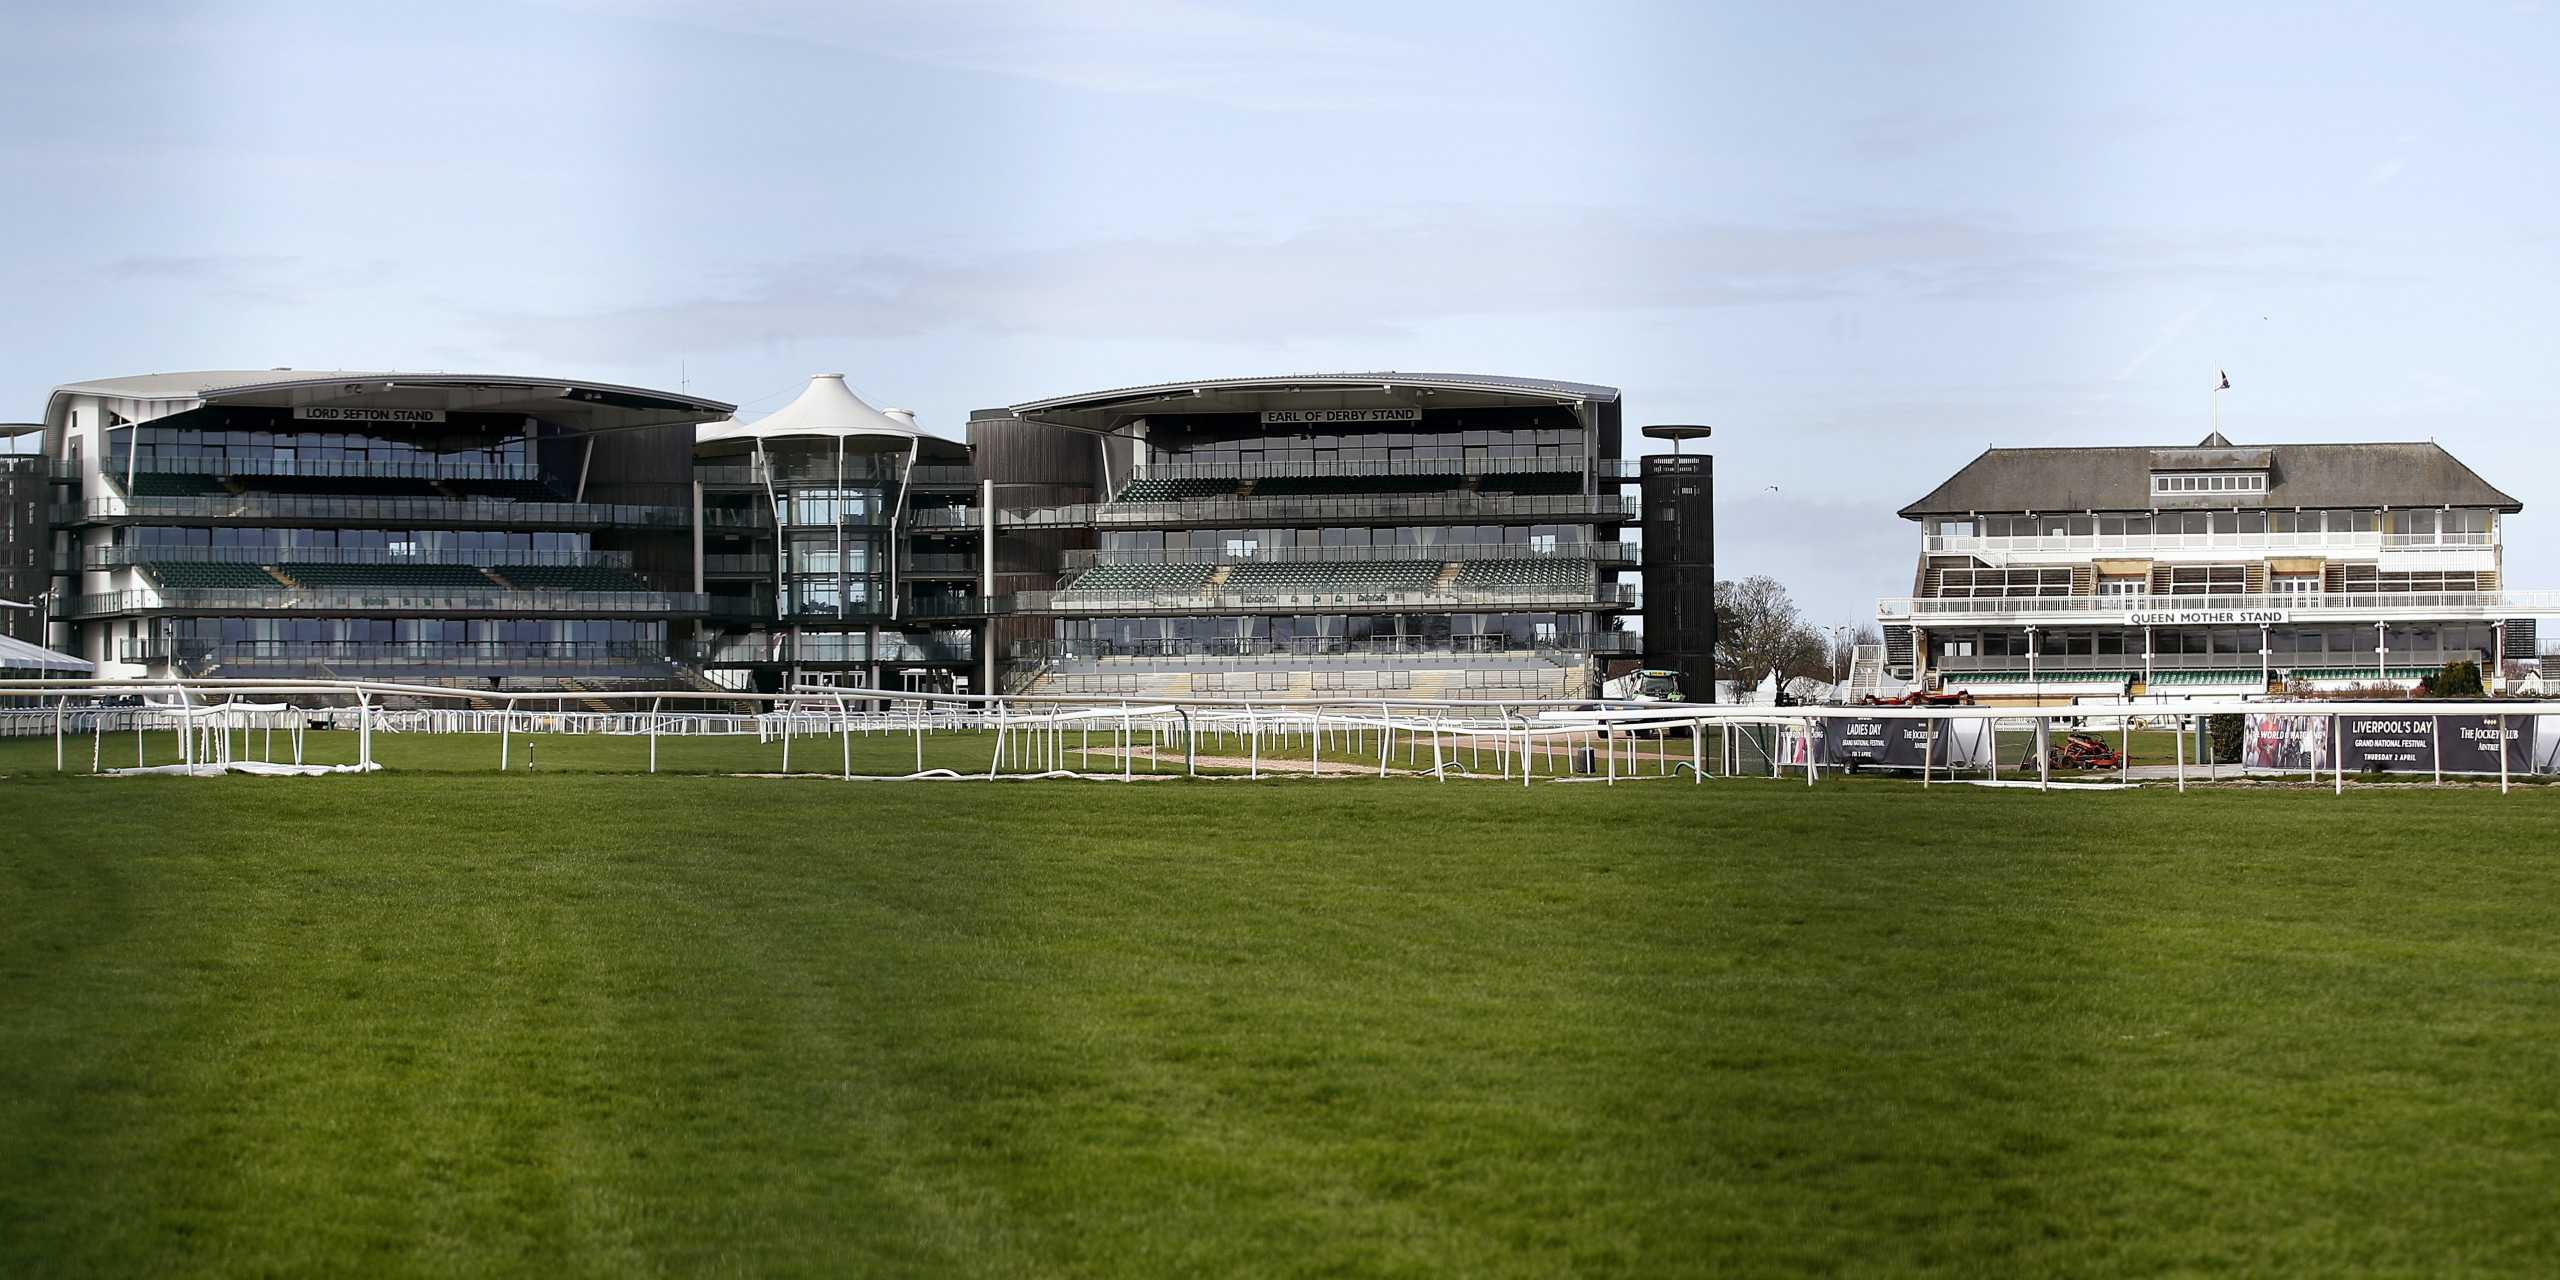 Peterborough Horse Races